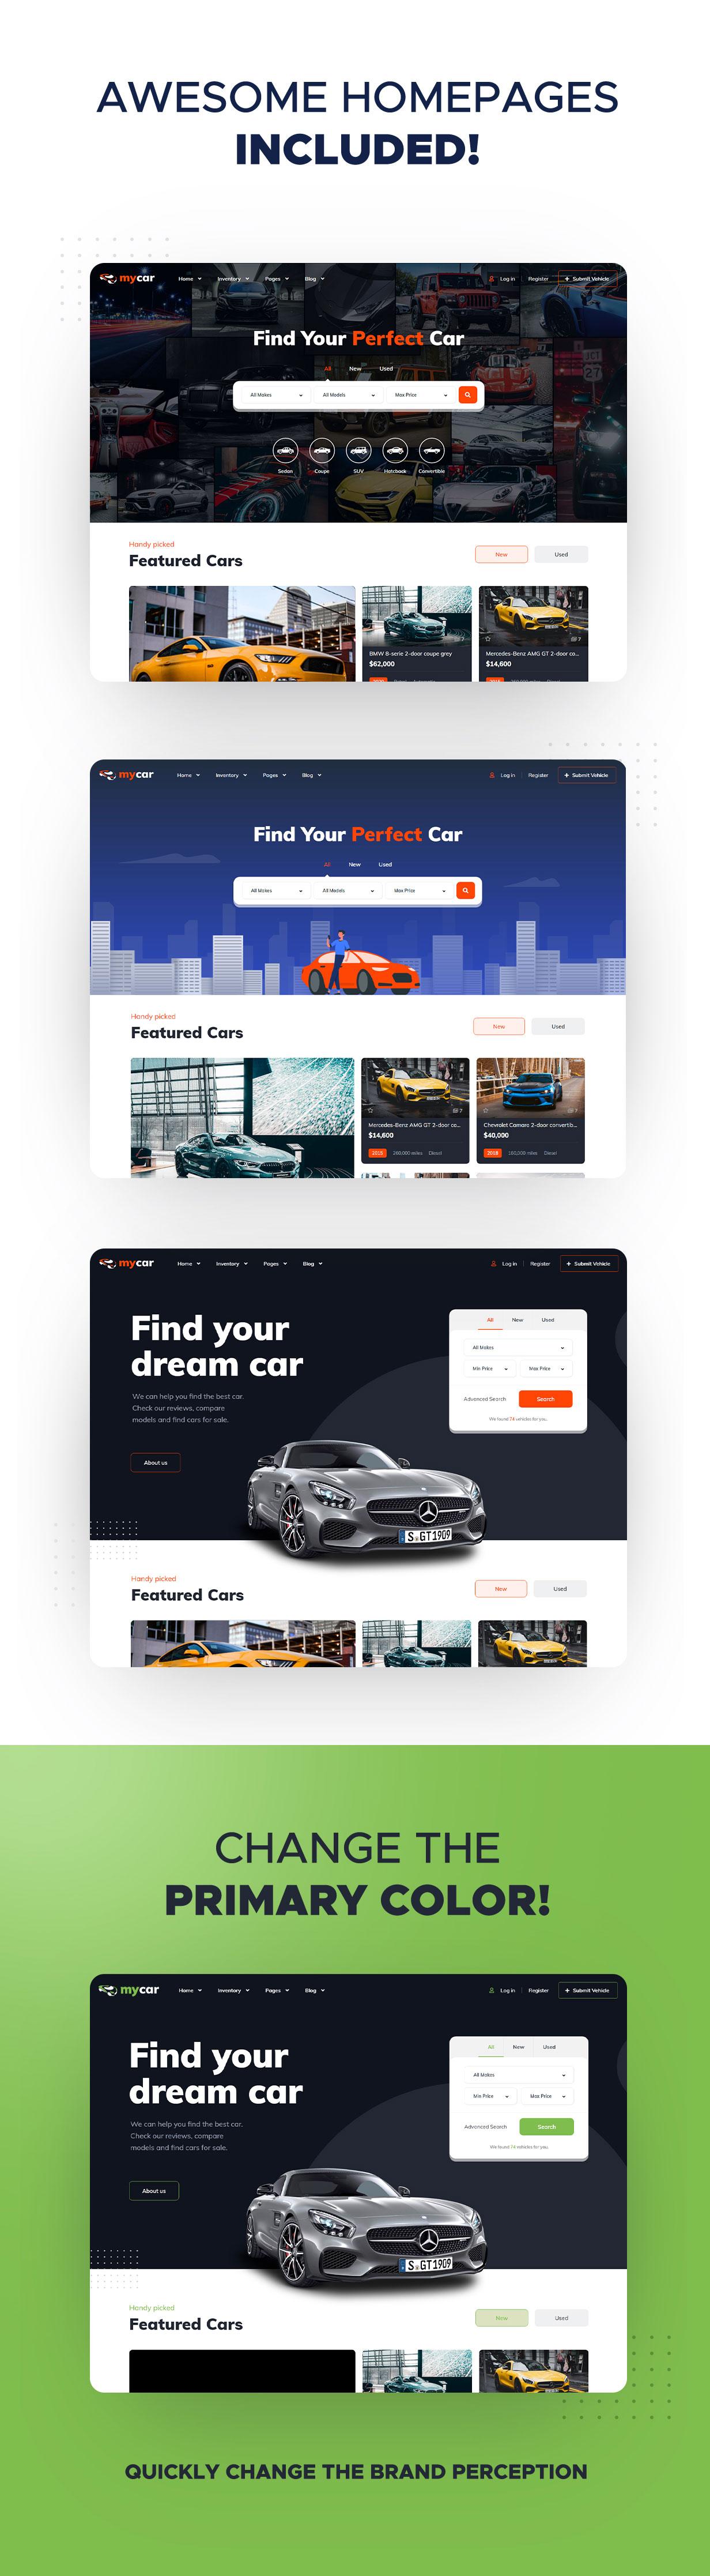 Vehica - Car Dealer & Automotive Directory - 9